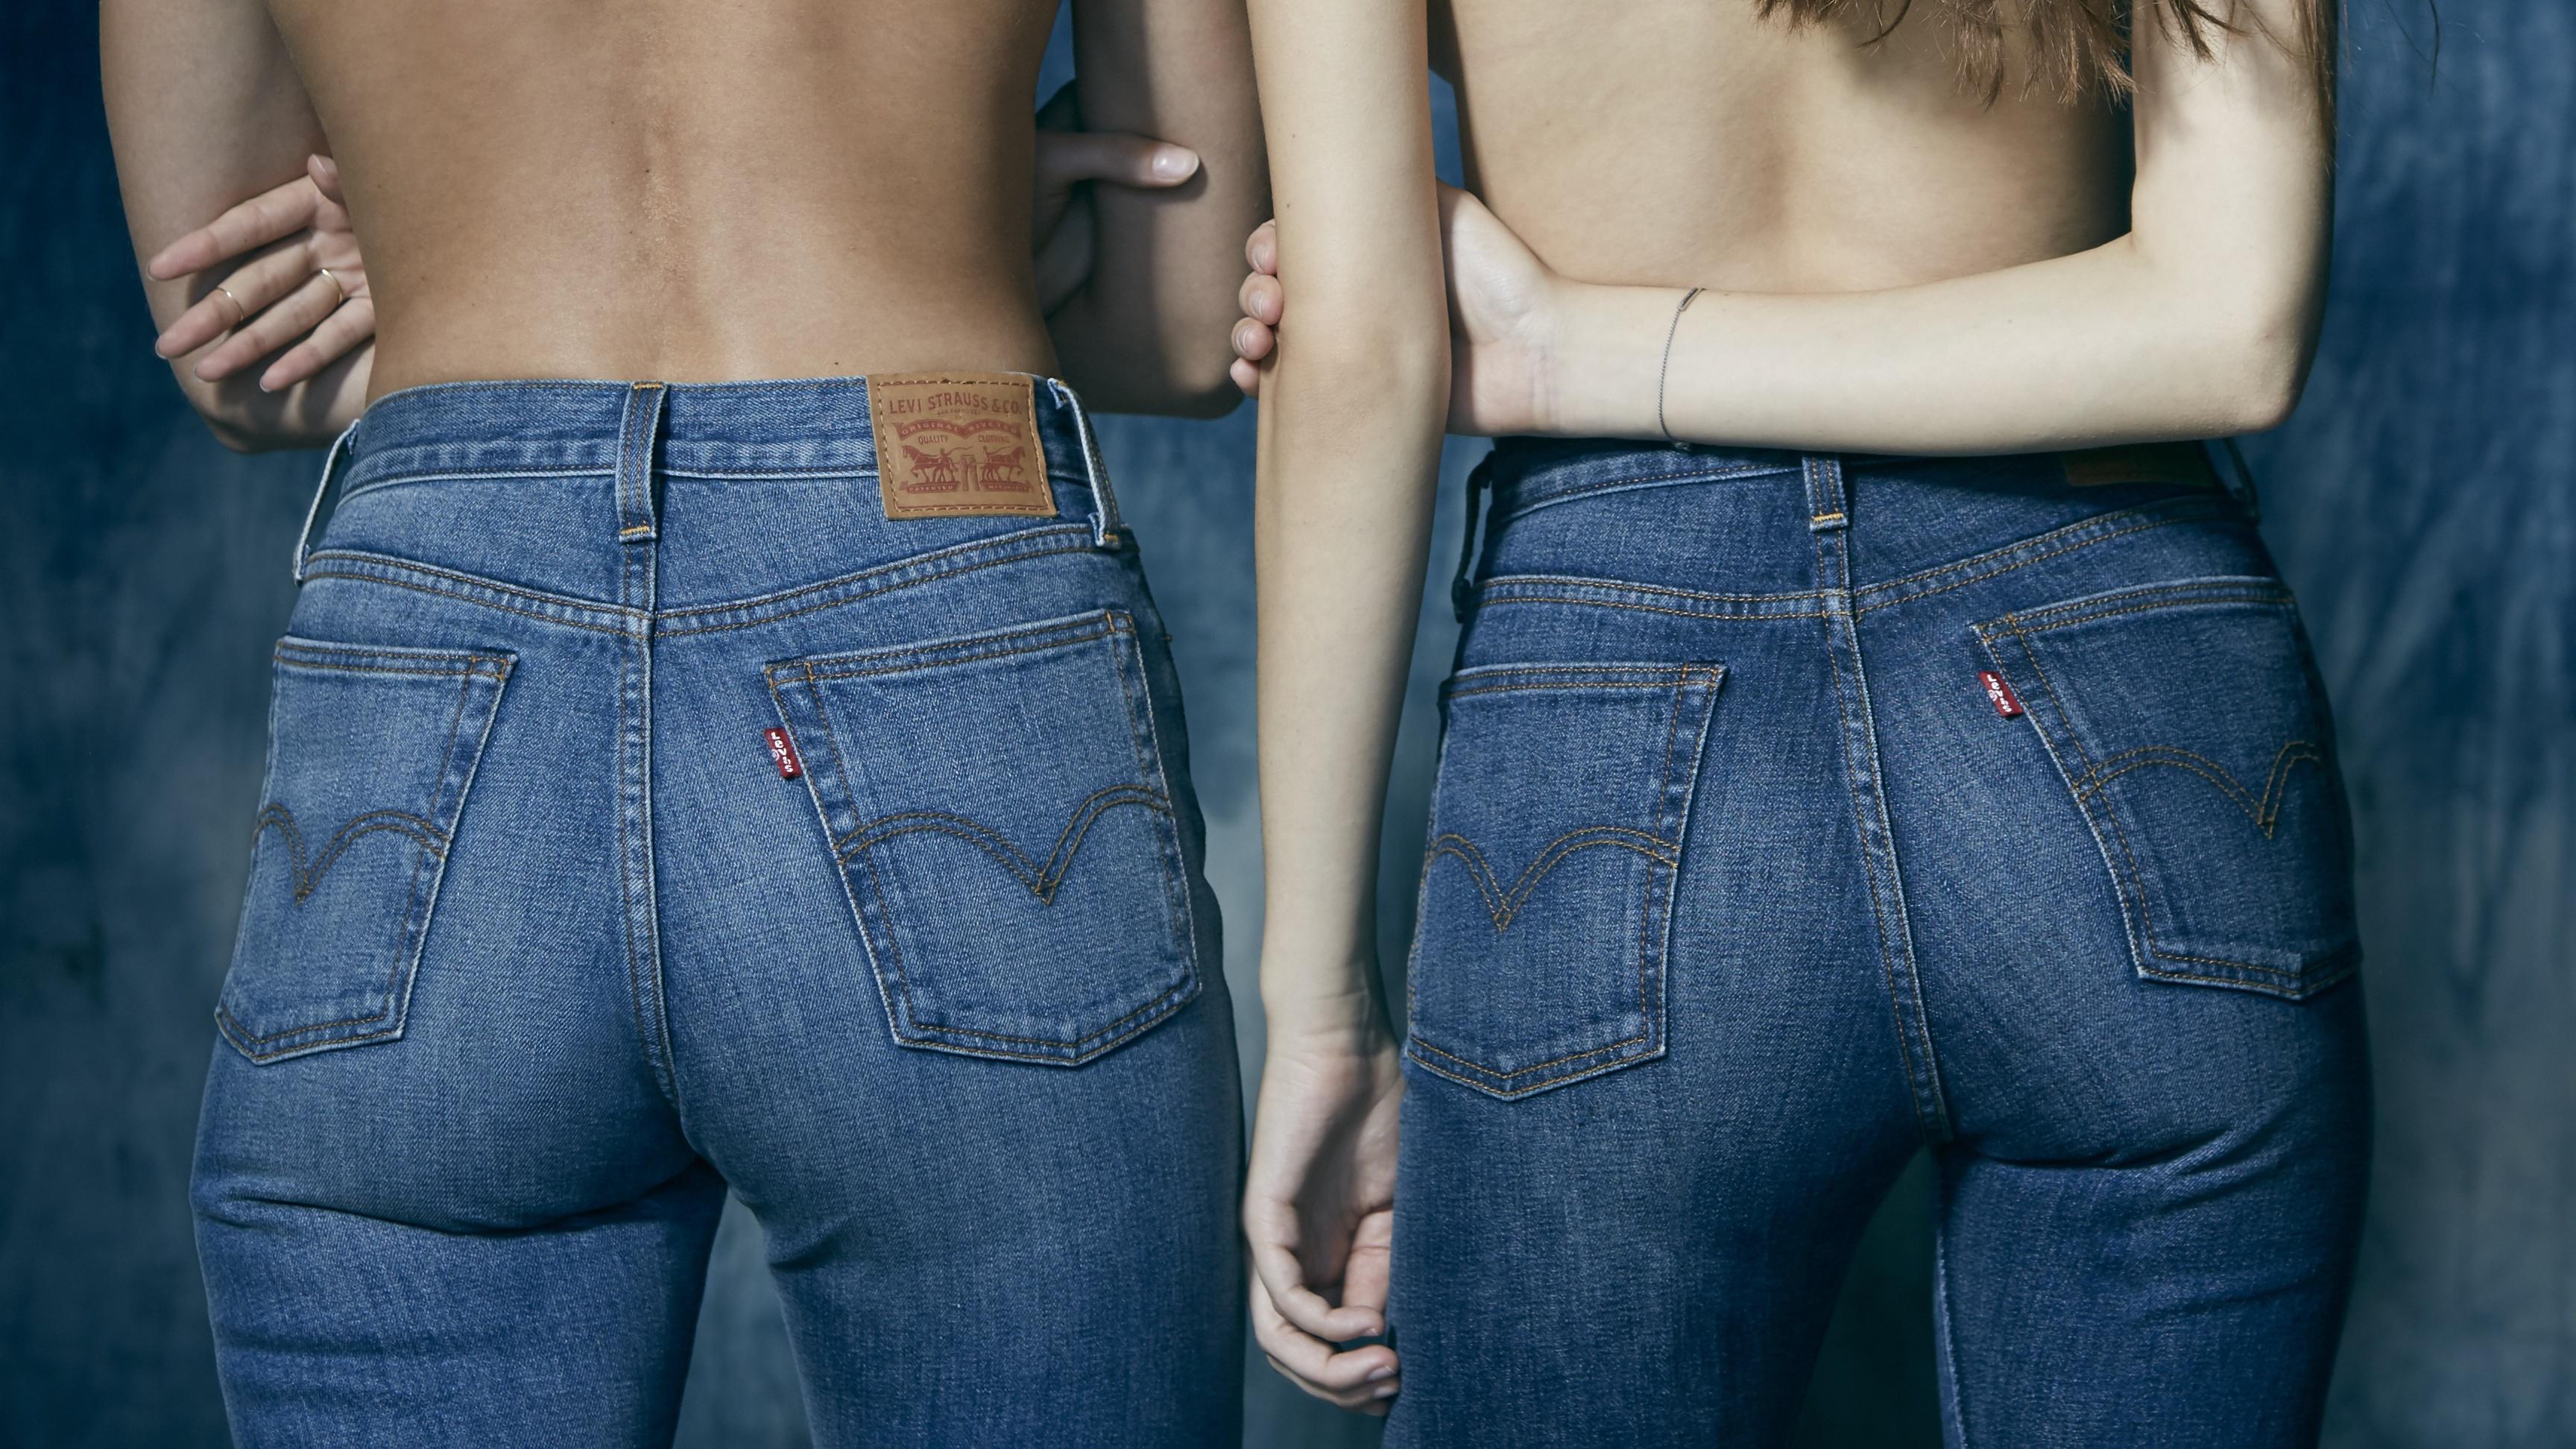 e798c5d9d7 Mom jeans are having a breakout summer as a fashion item — Quartz